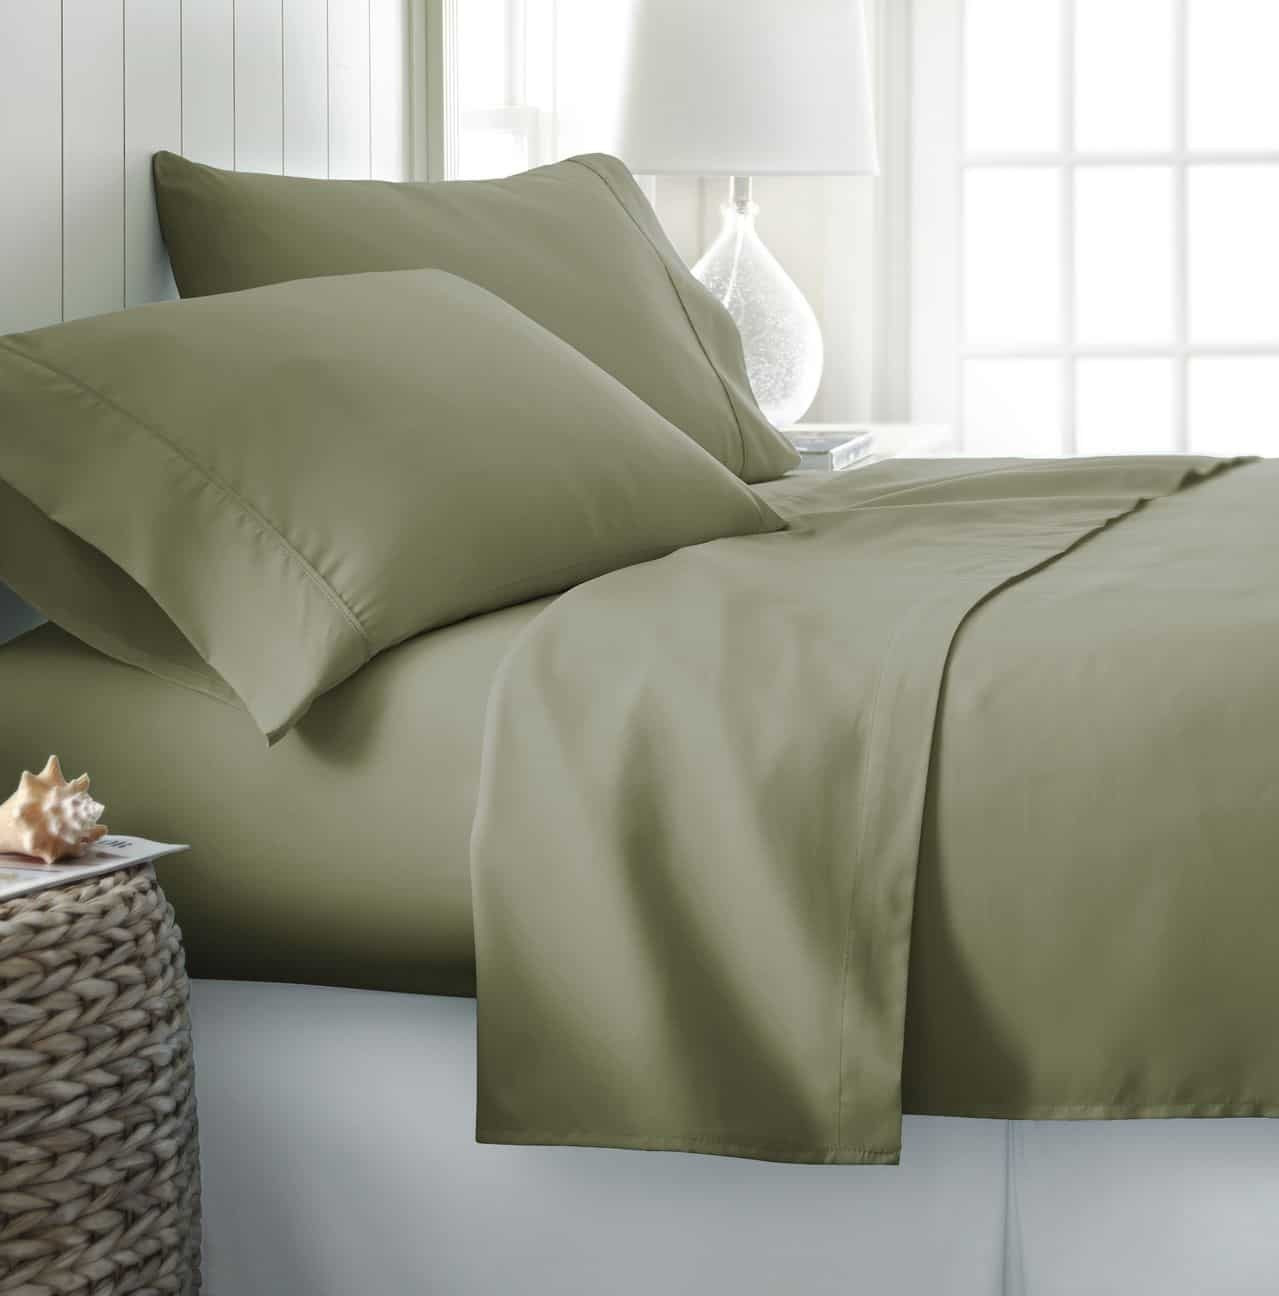 Spreadsheet Bed Sheets In 23 Best Of Spreadsheet Bed Sheets  Boxsprings, Bedden  Matrassen